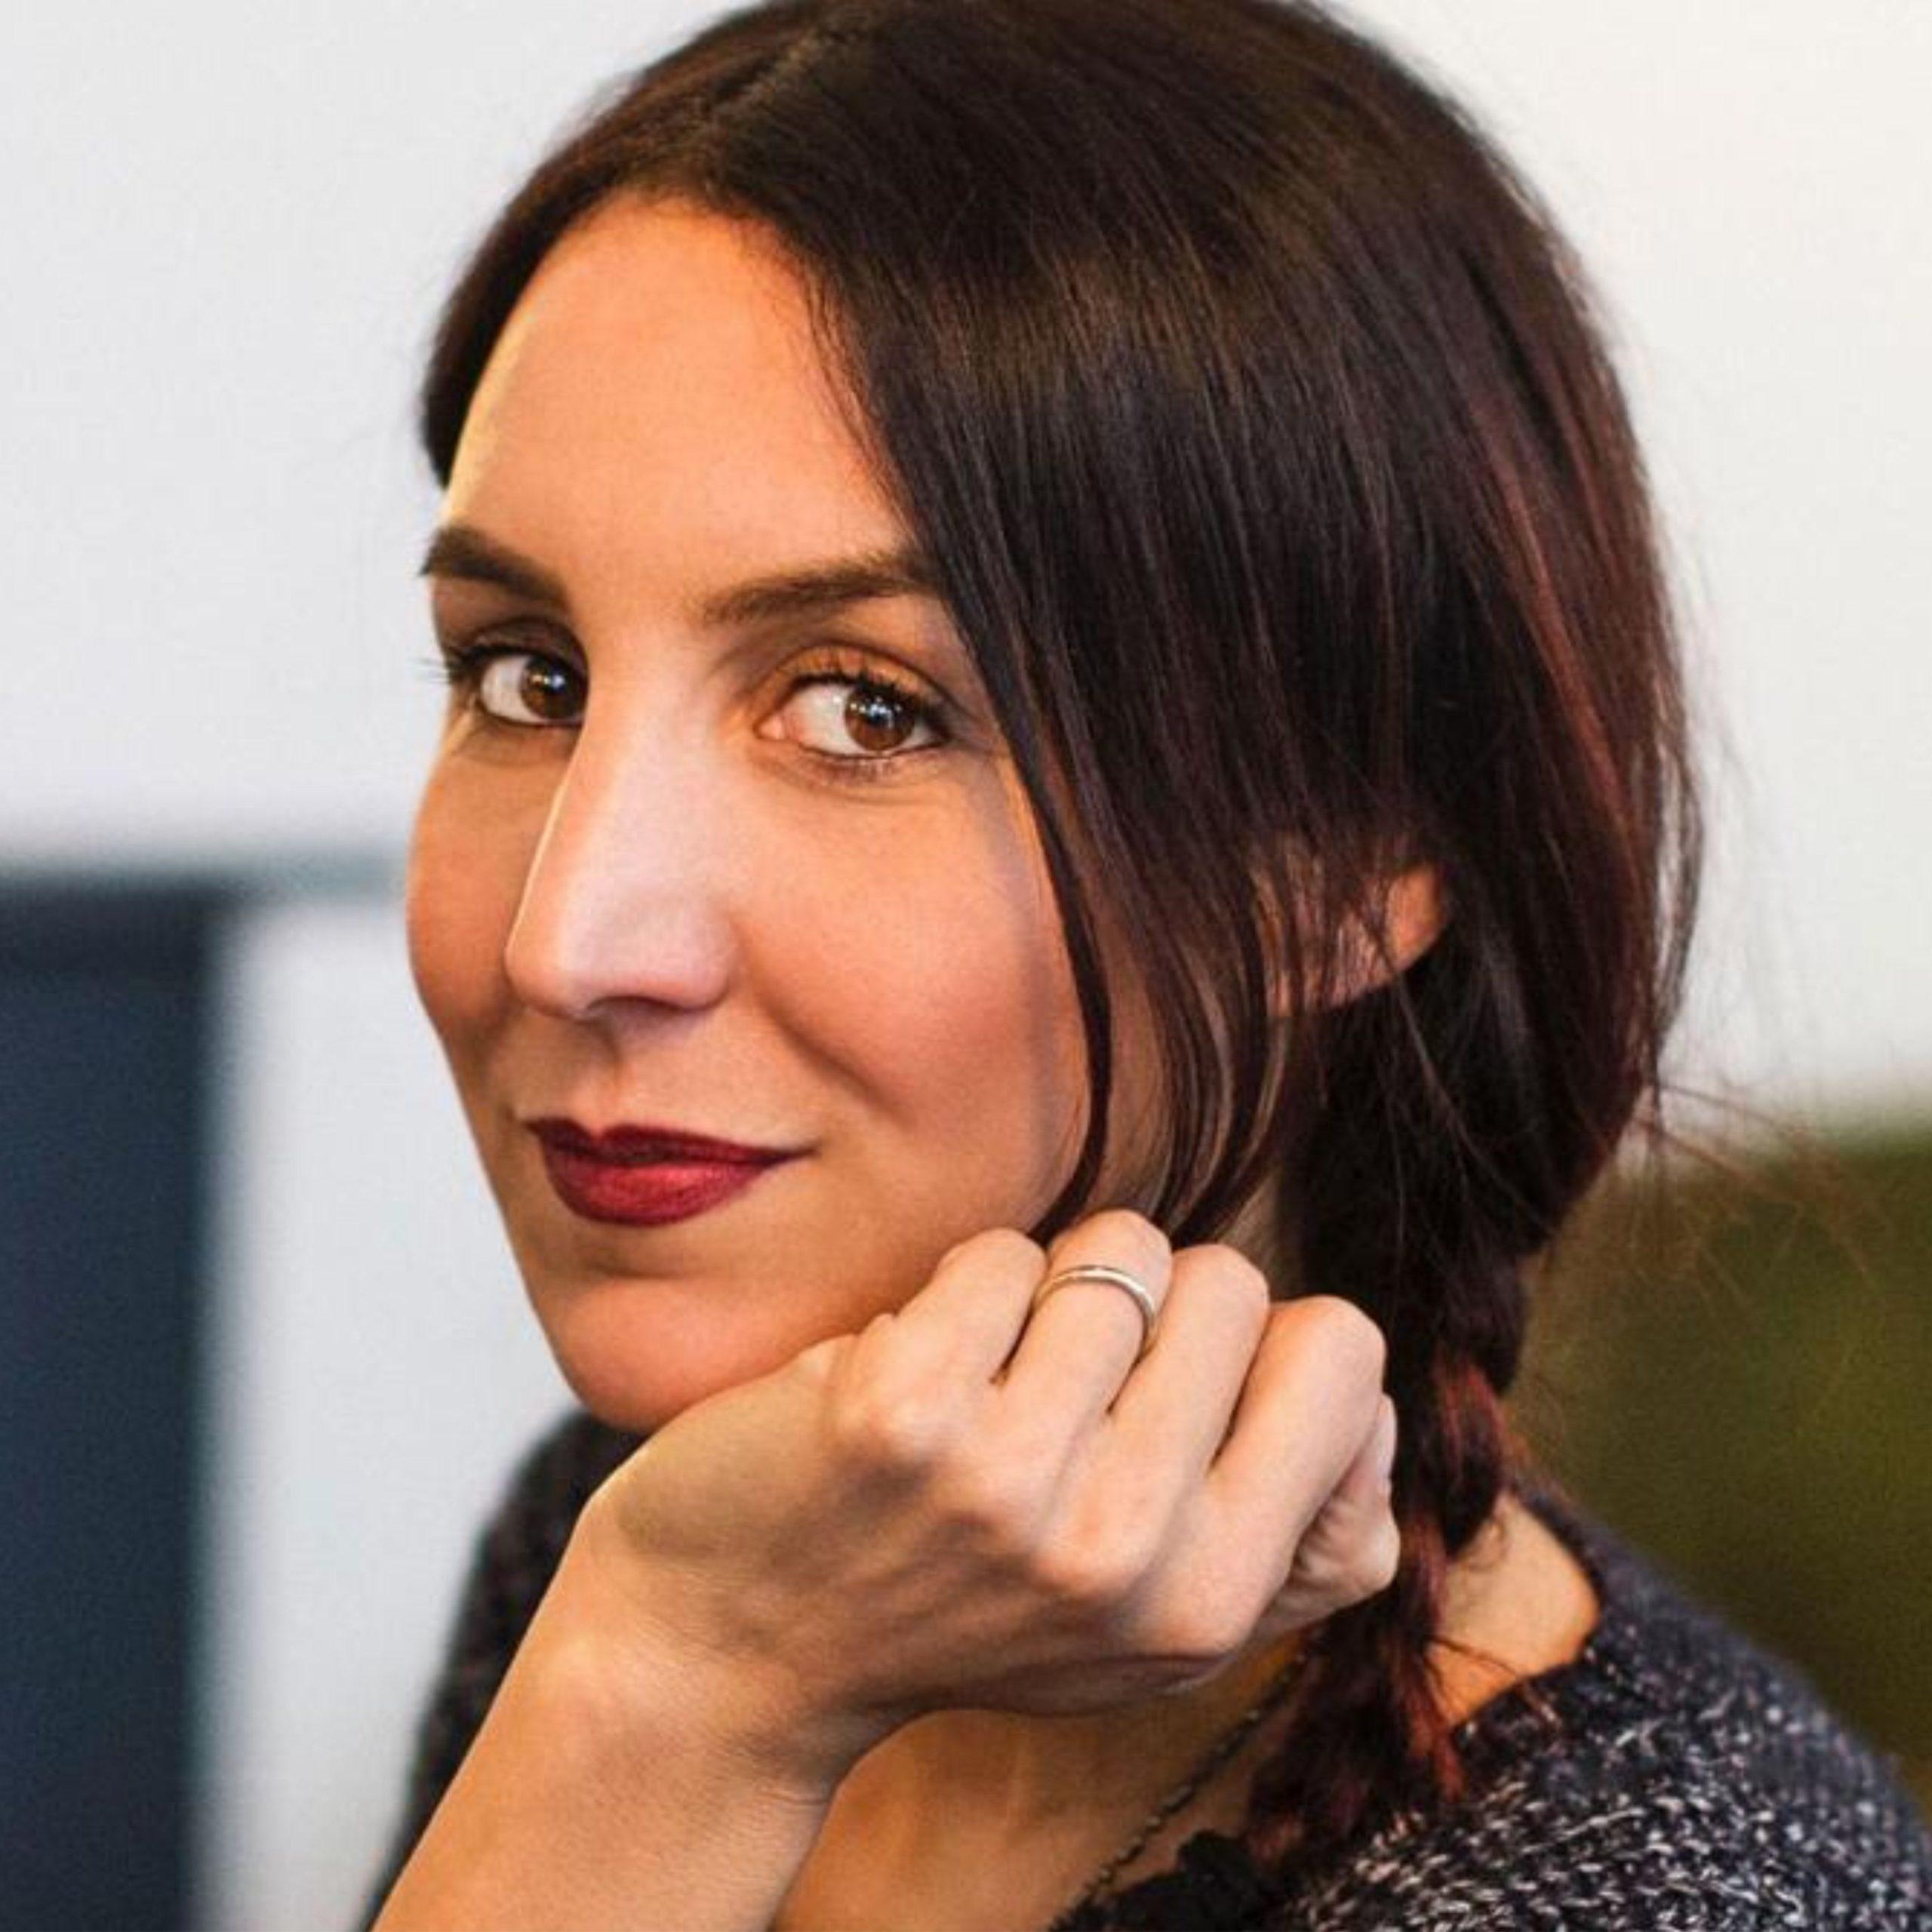 Manuela Speroni per l'Italian Wedding Planner Congress | Wedding Planner Academy